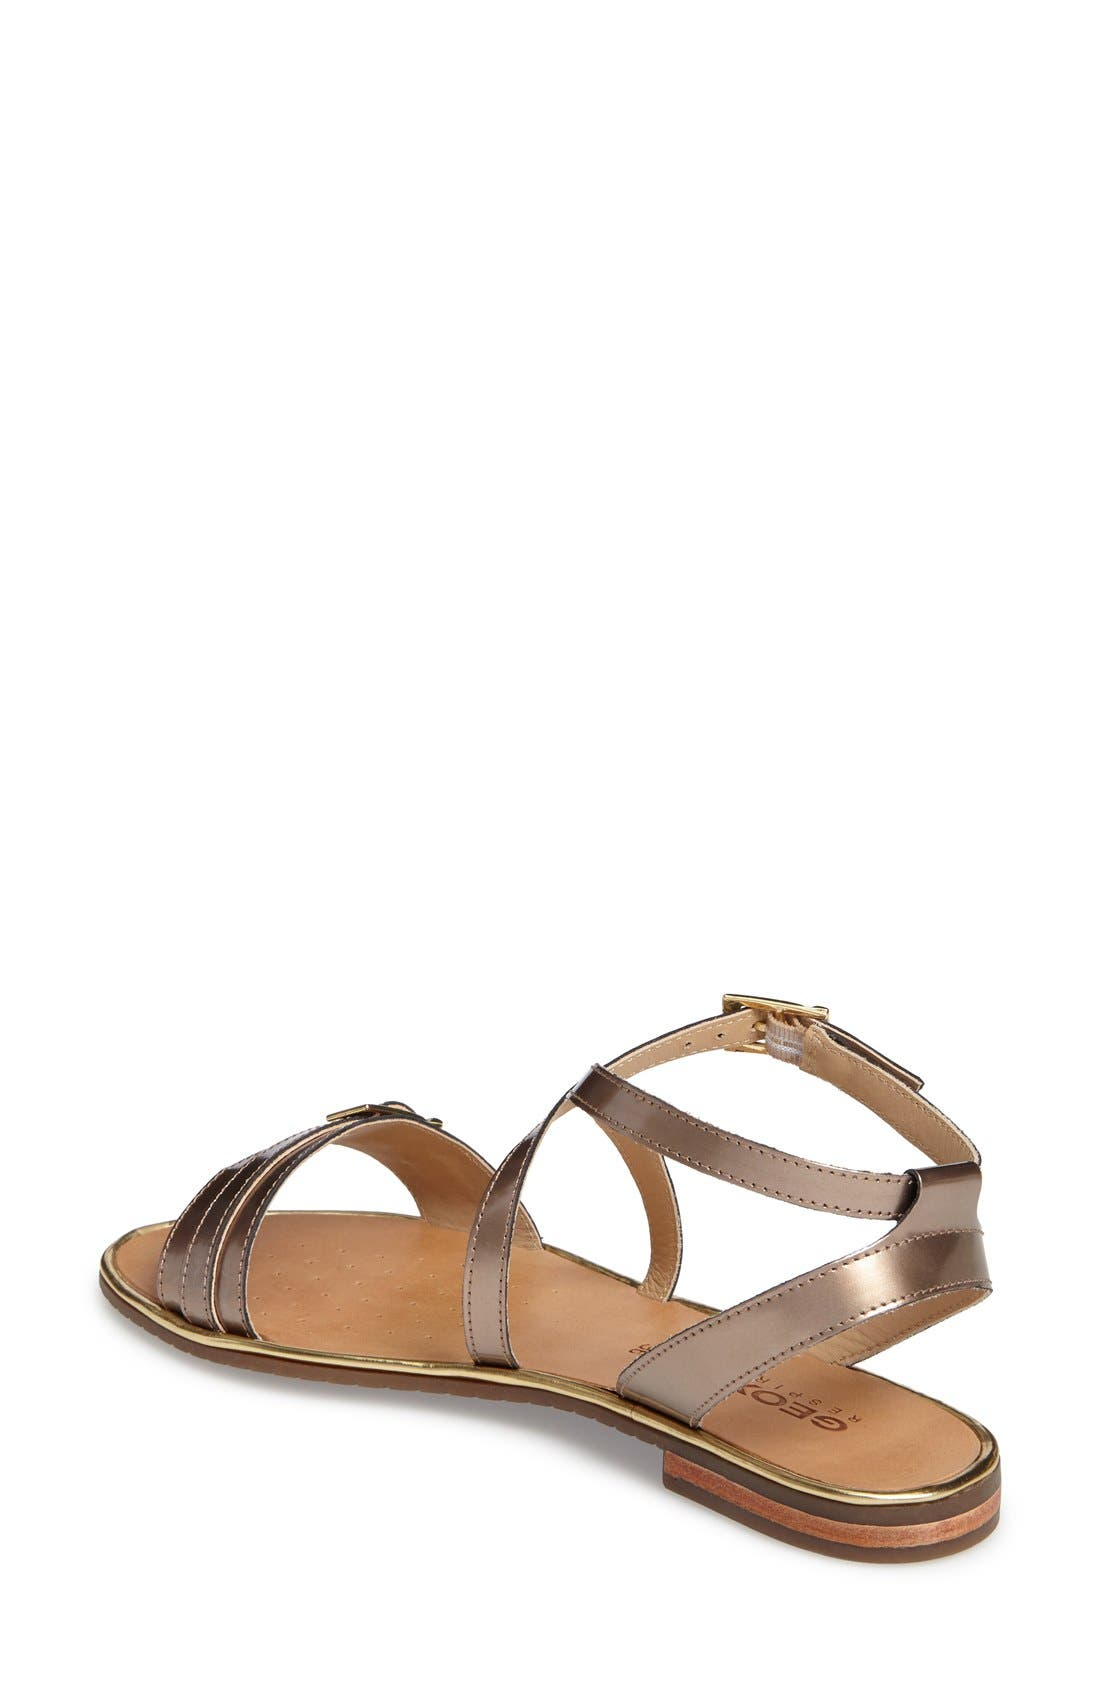 Alternate Image 2  - Geox 'Sozy' Sandal (Women)